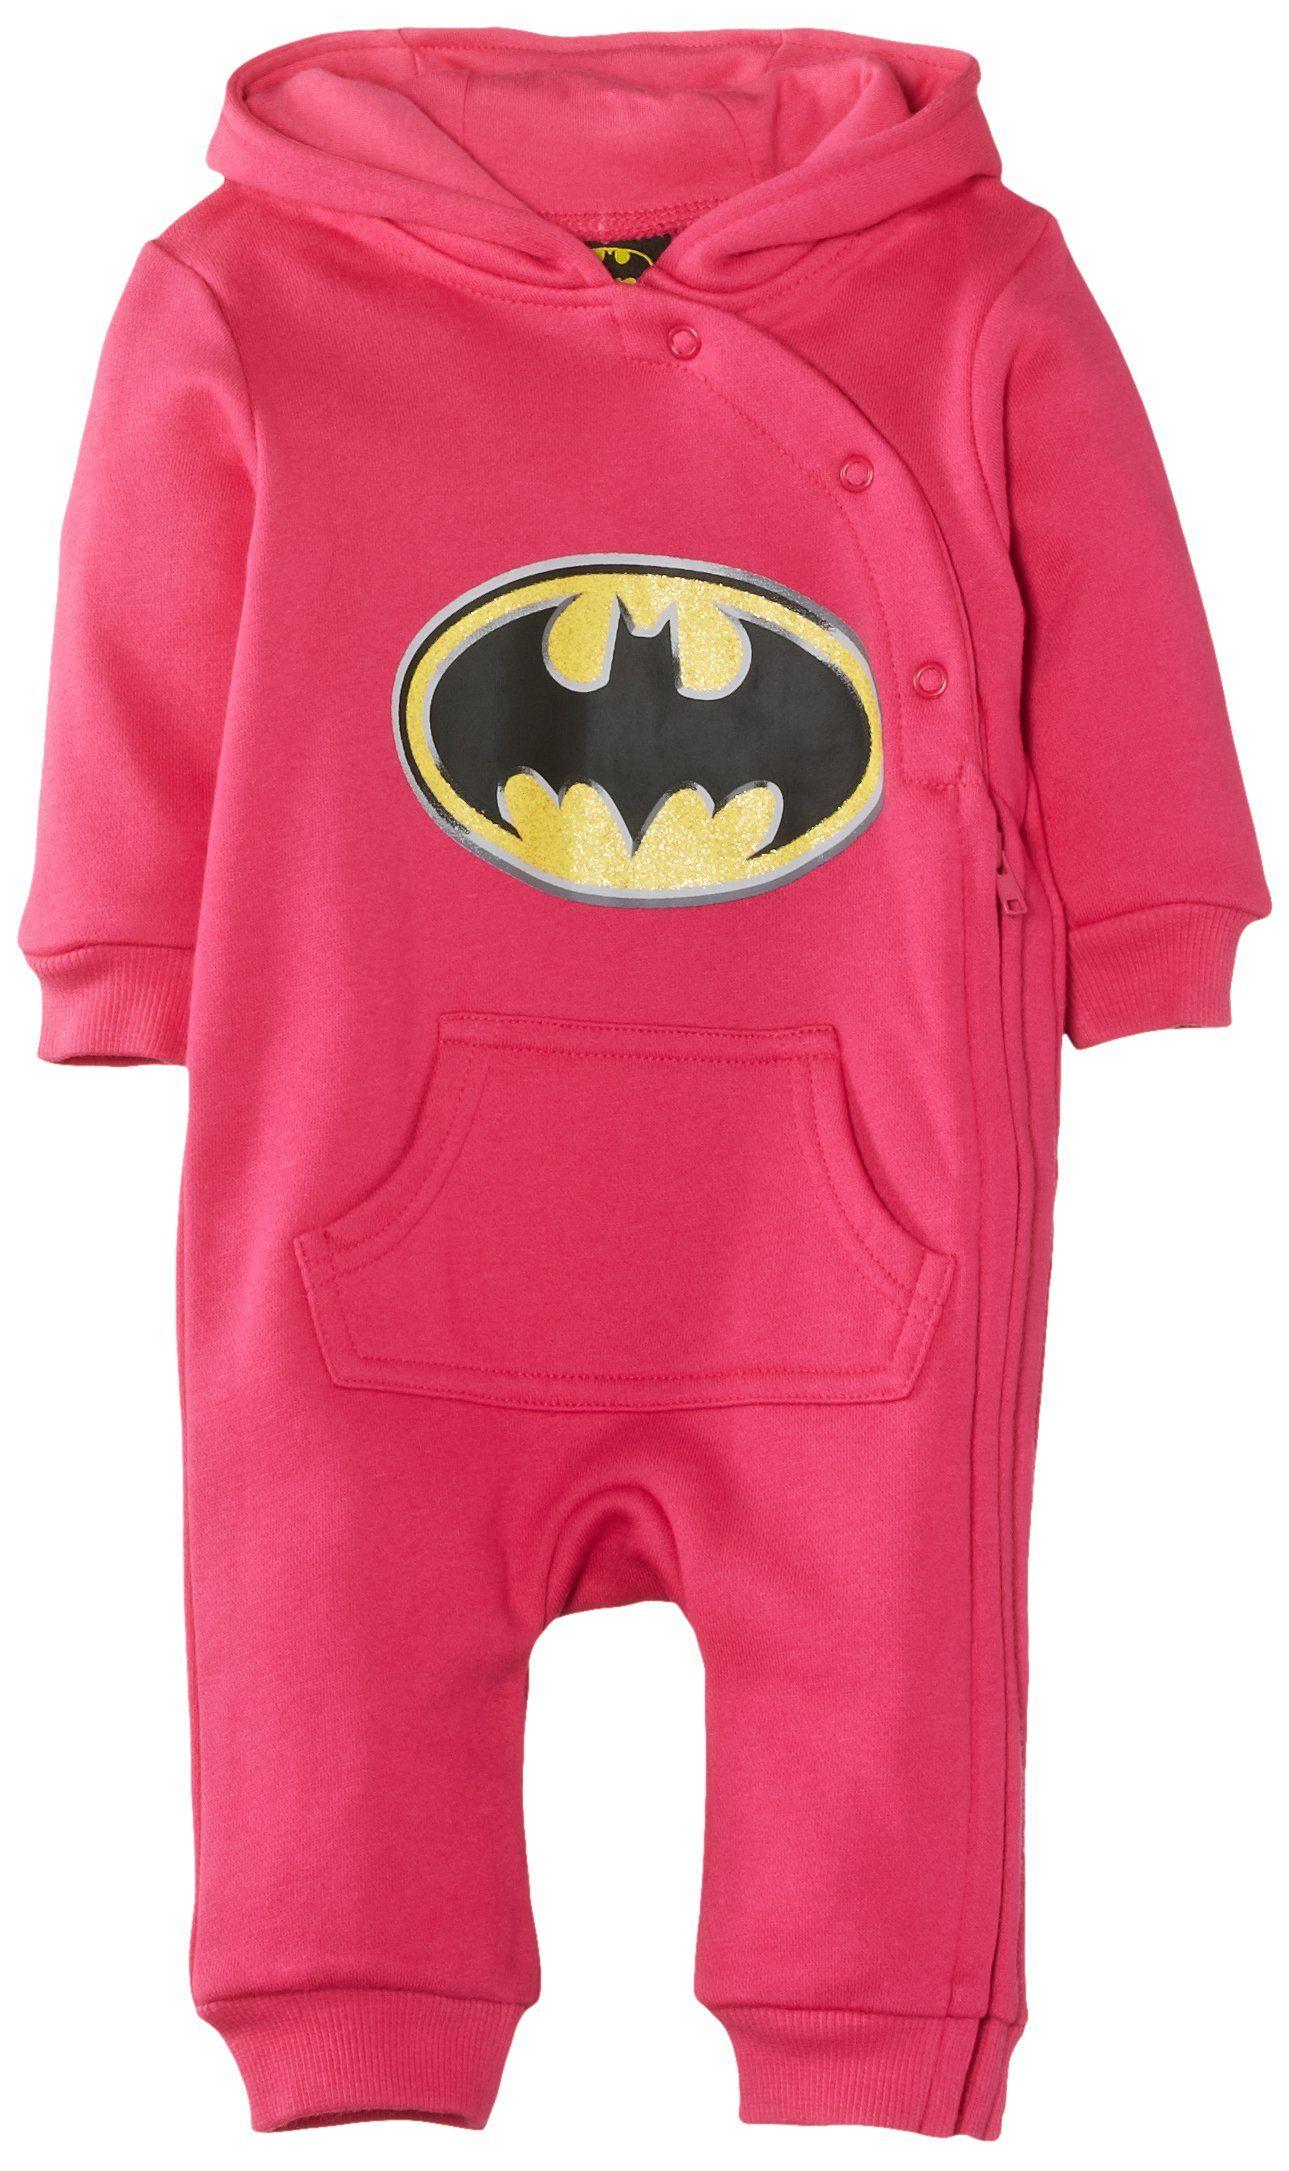 d6b0a2ea3e8c Batman Baby Girl s Onesie Clothing Set  Amazon.co.uk